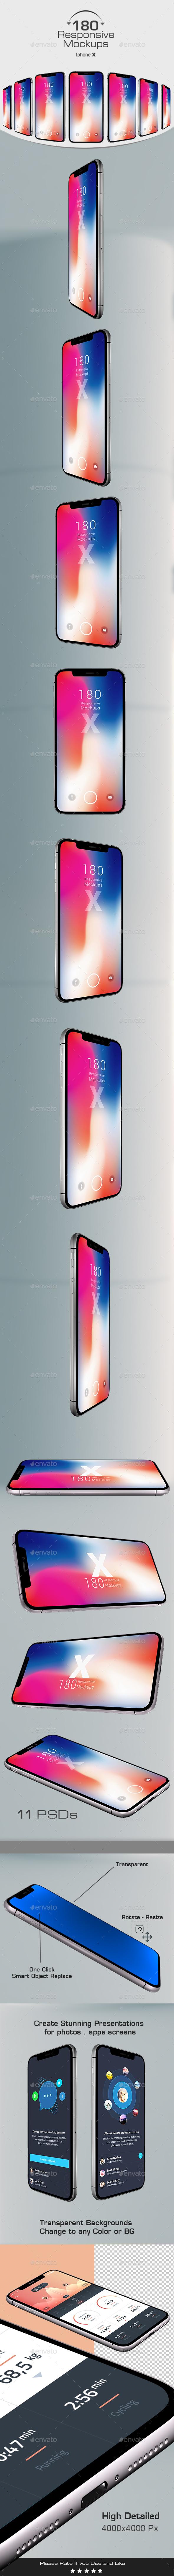 180 Responsive 3D Mockups - Phone X